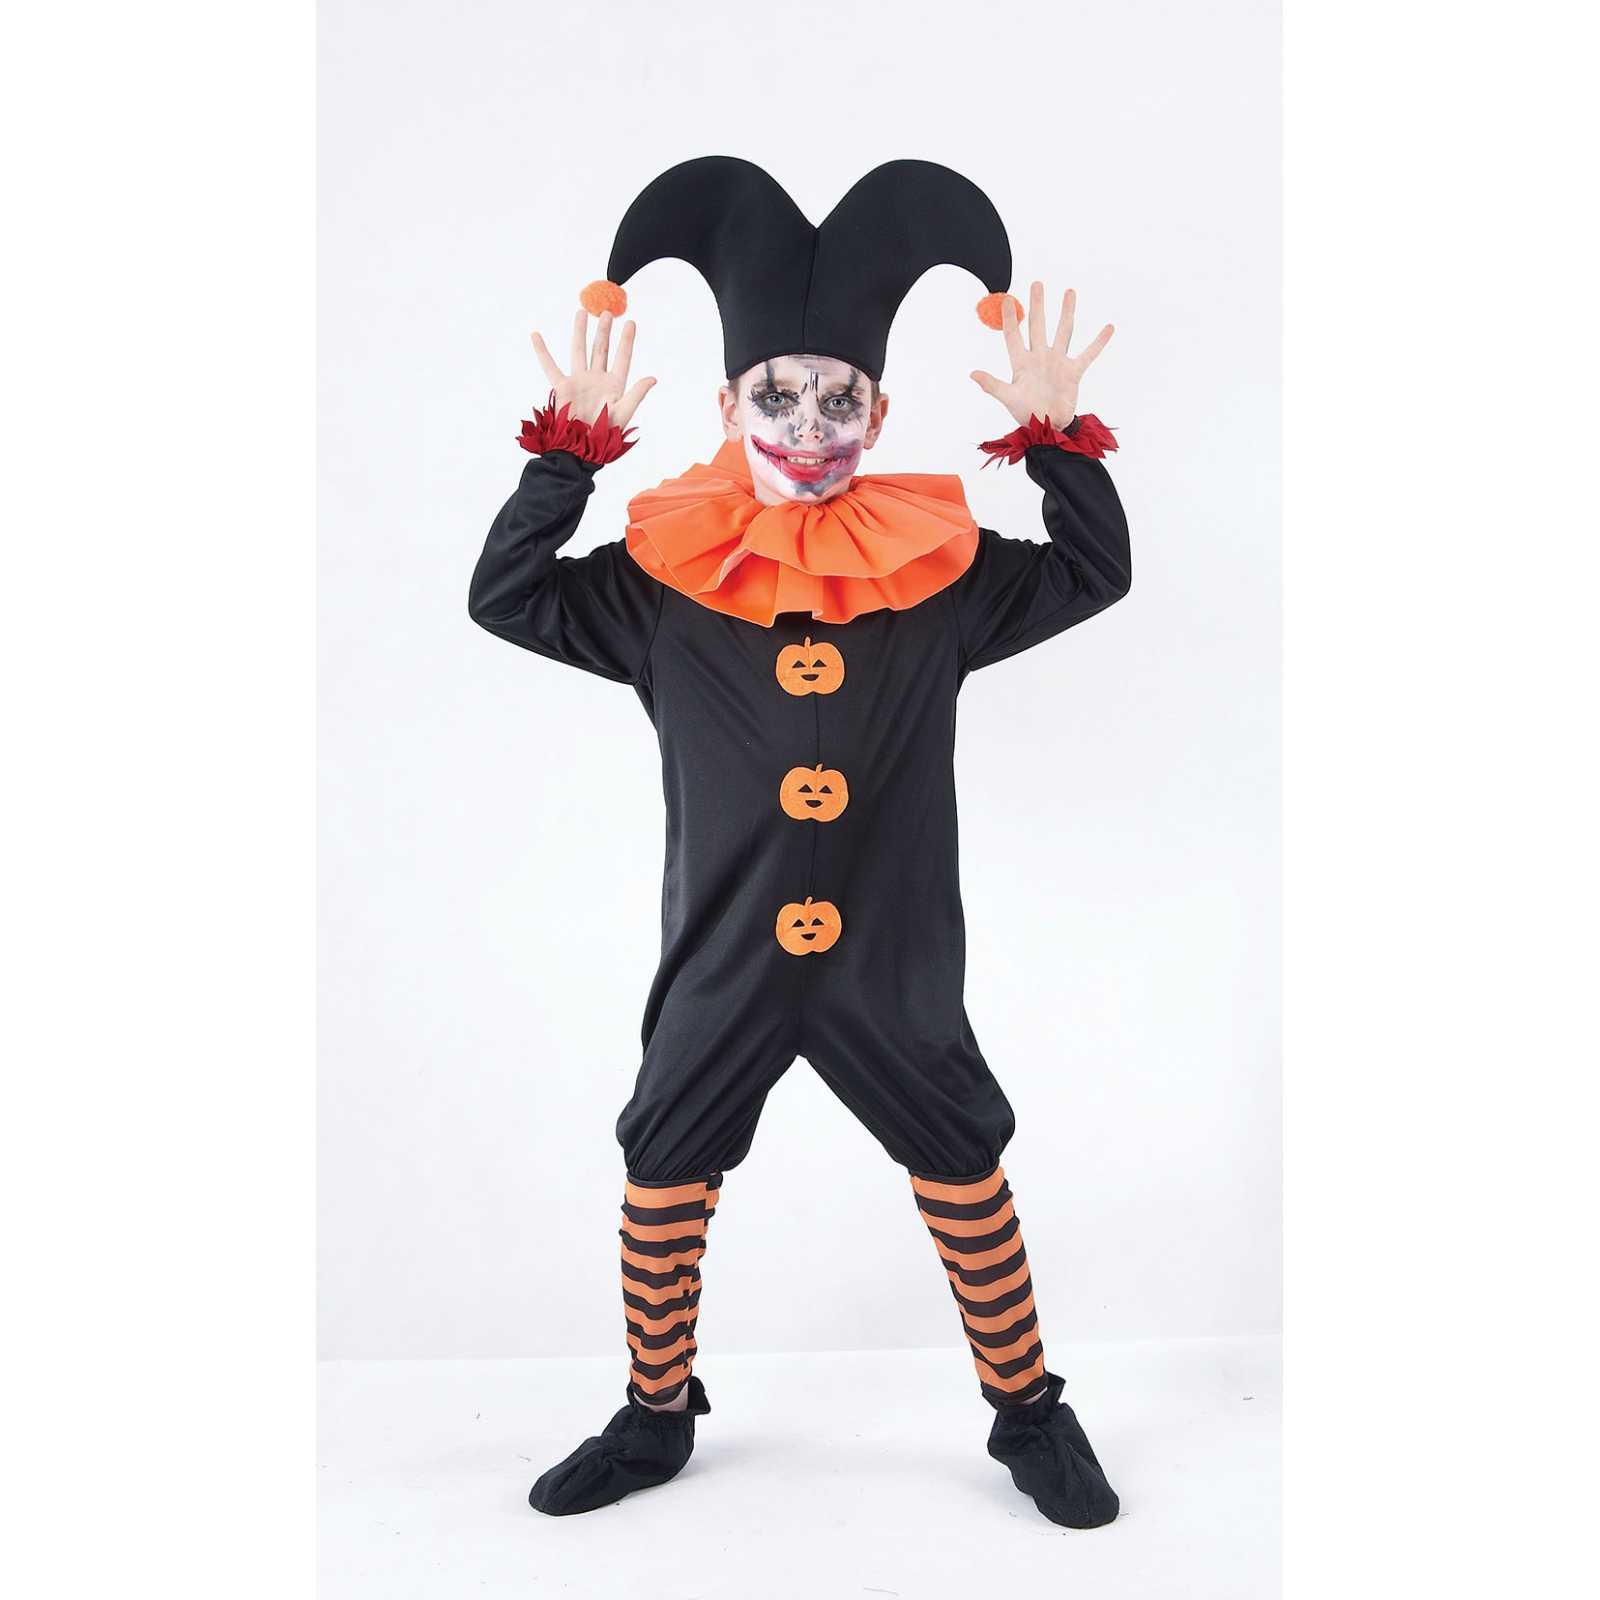 boeser narr kostuem fuer kinder harlekin schelm clown horror fasching halloween ebay. Black Bedroom Furniture Sets. Home Design Ideas